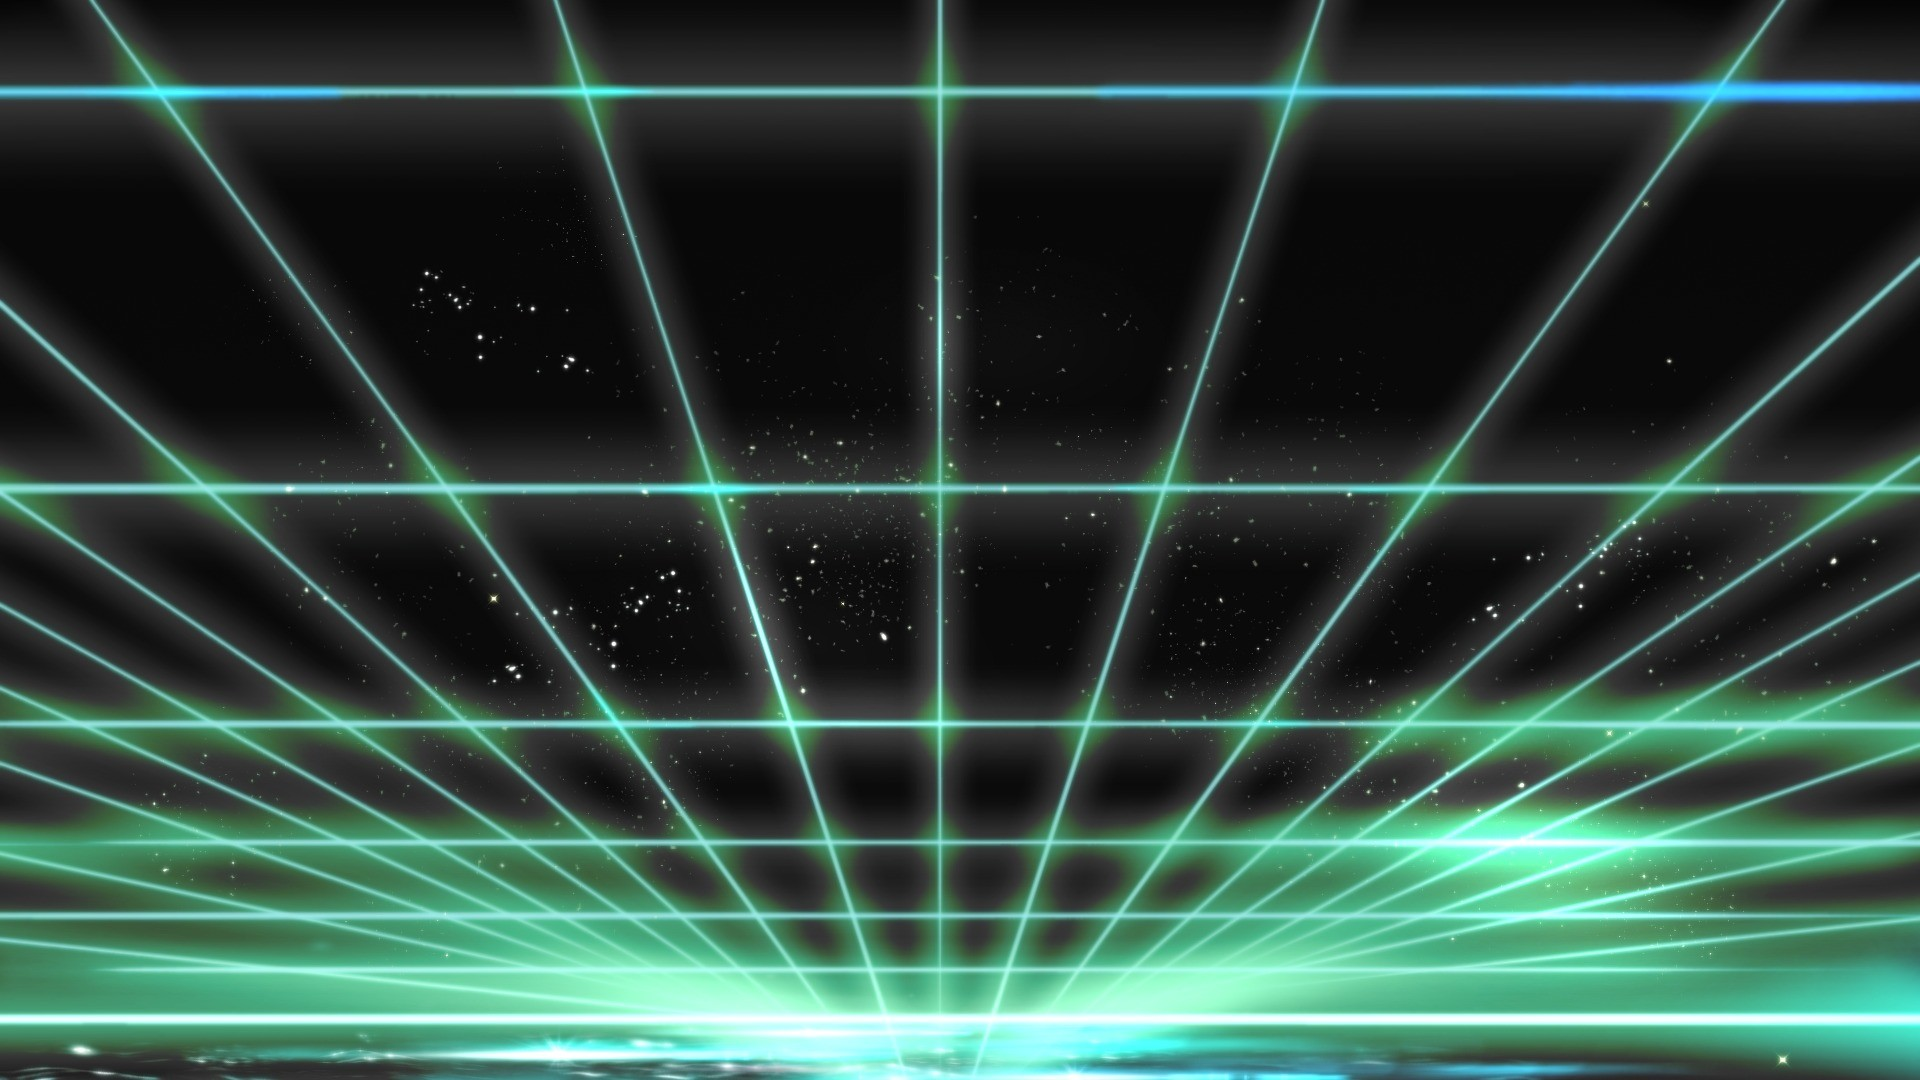 Tron Light Grid Wallpaper